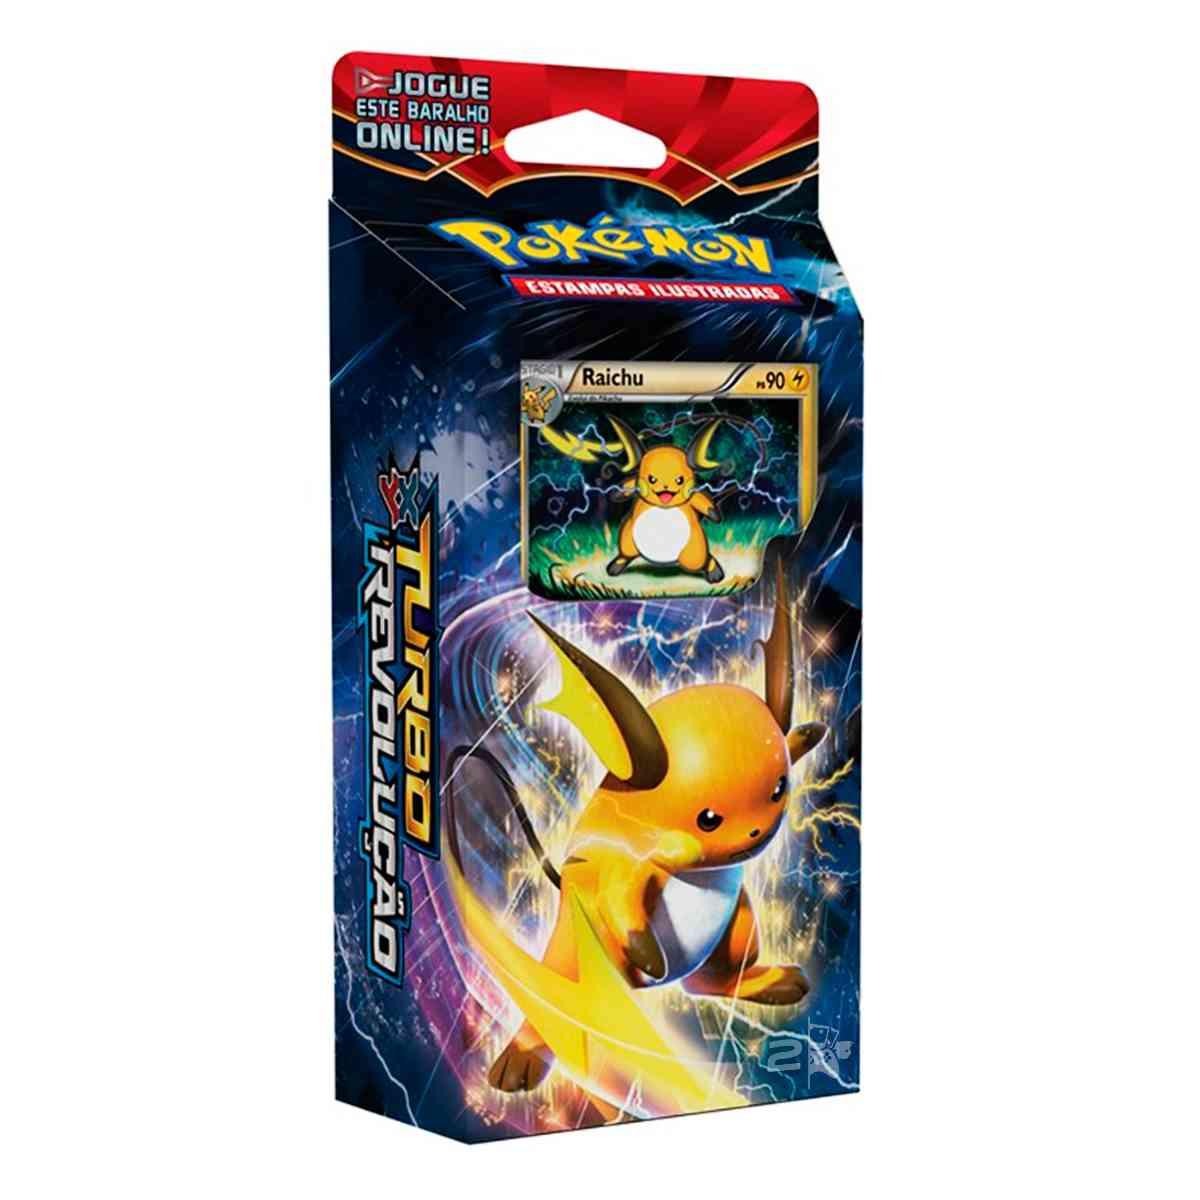 Pokemon Deck Turbo Revolução XY8 Raichu Noivern